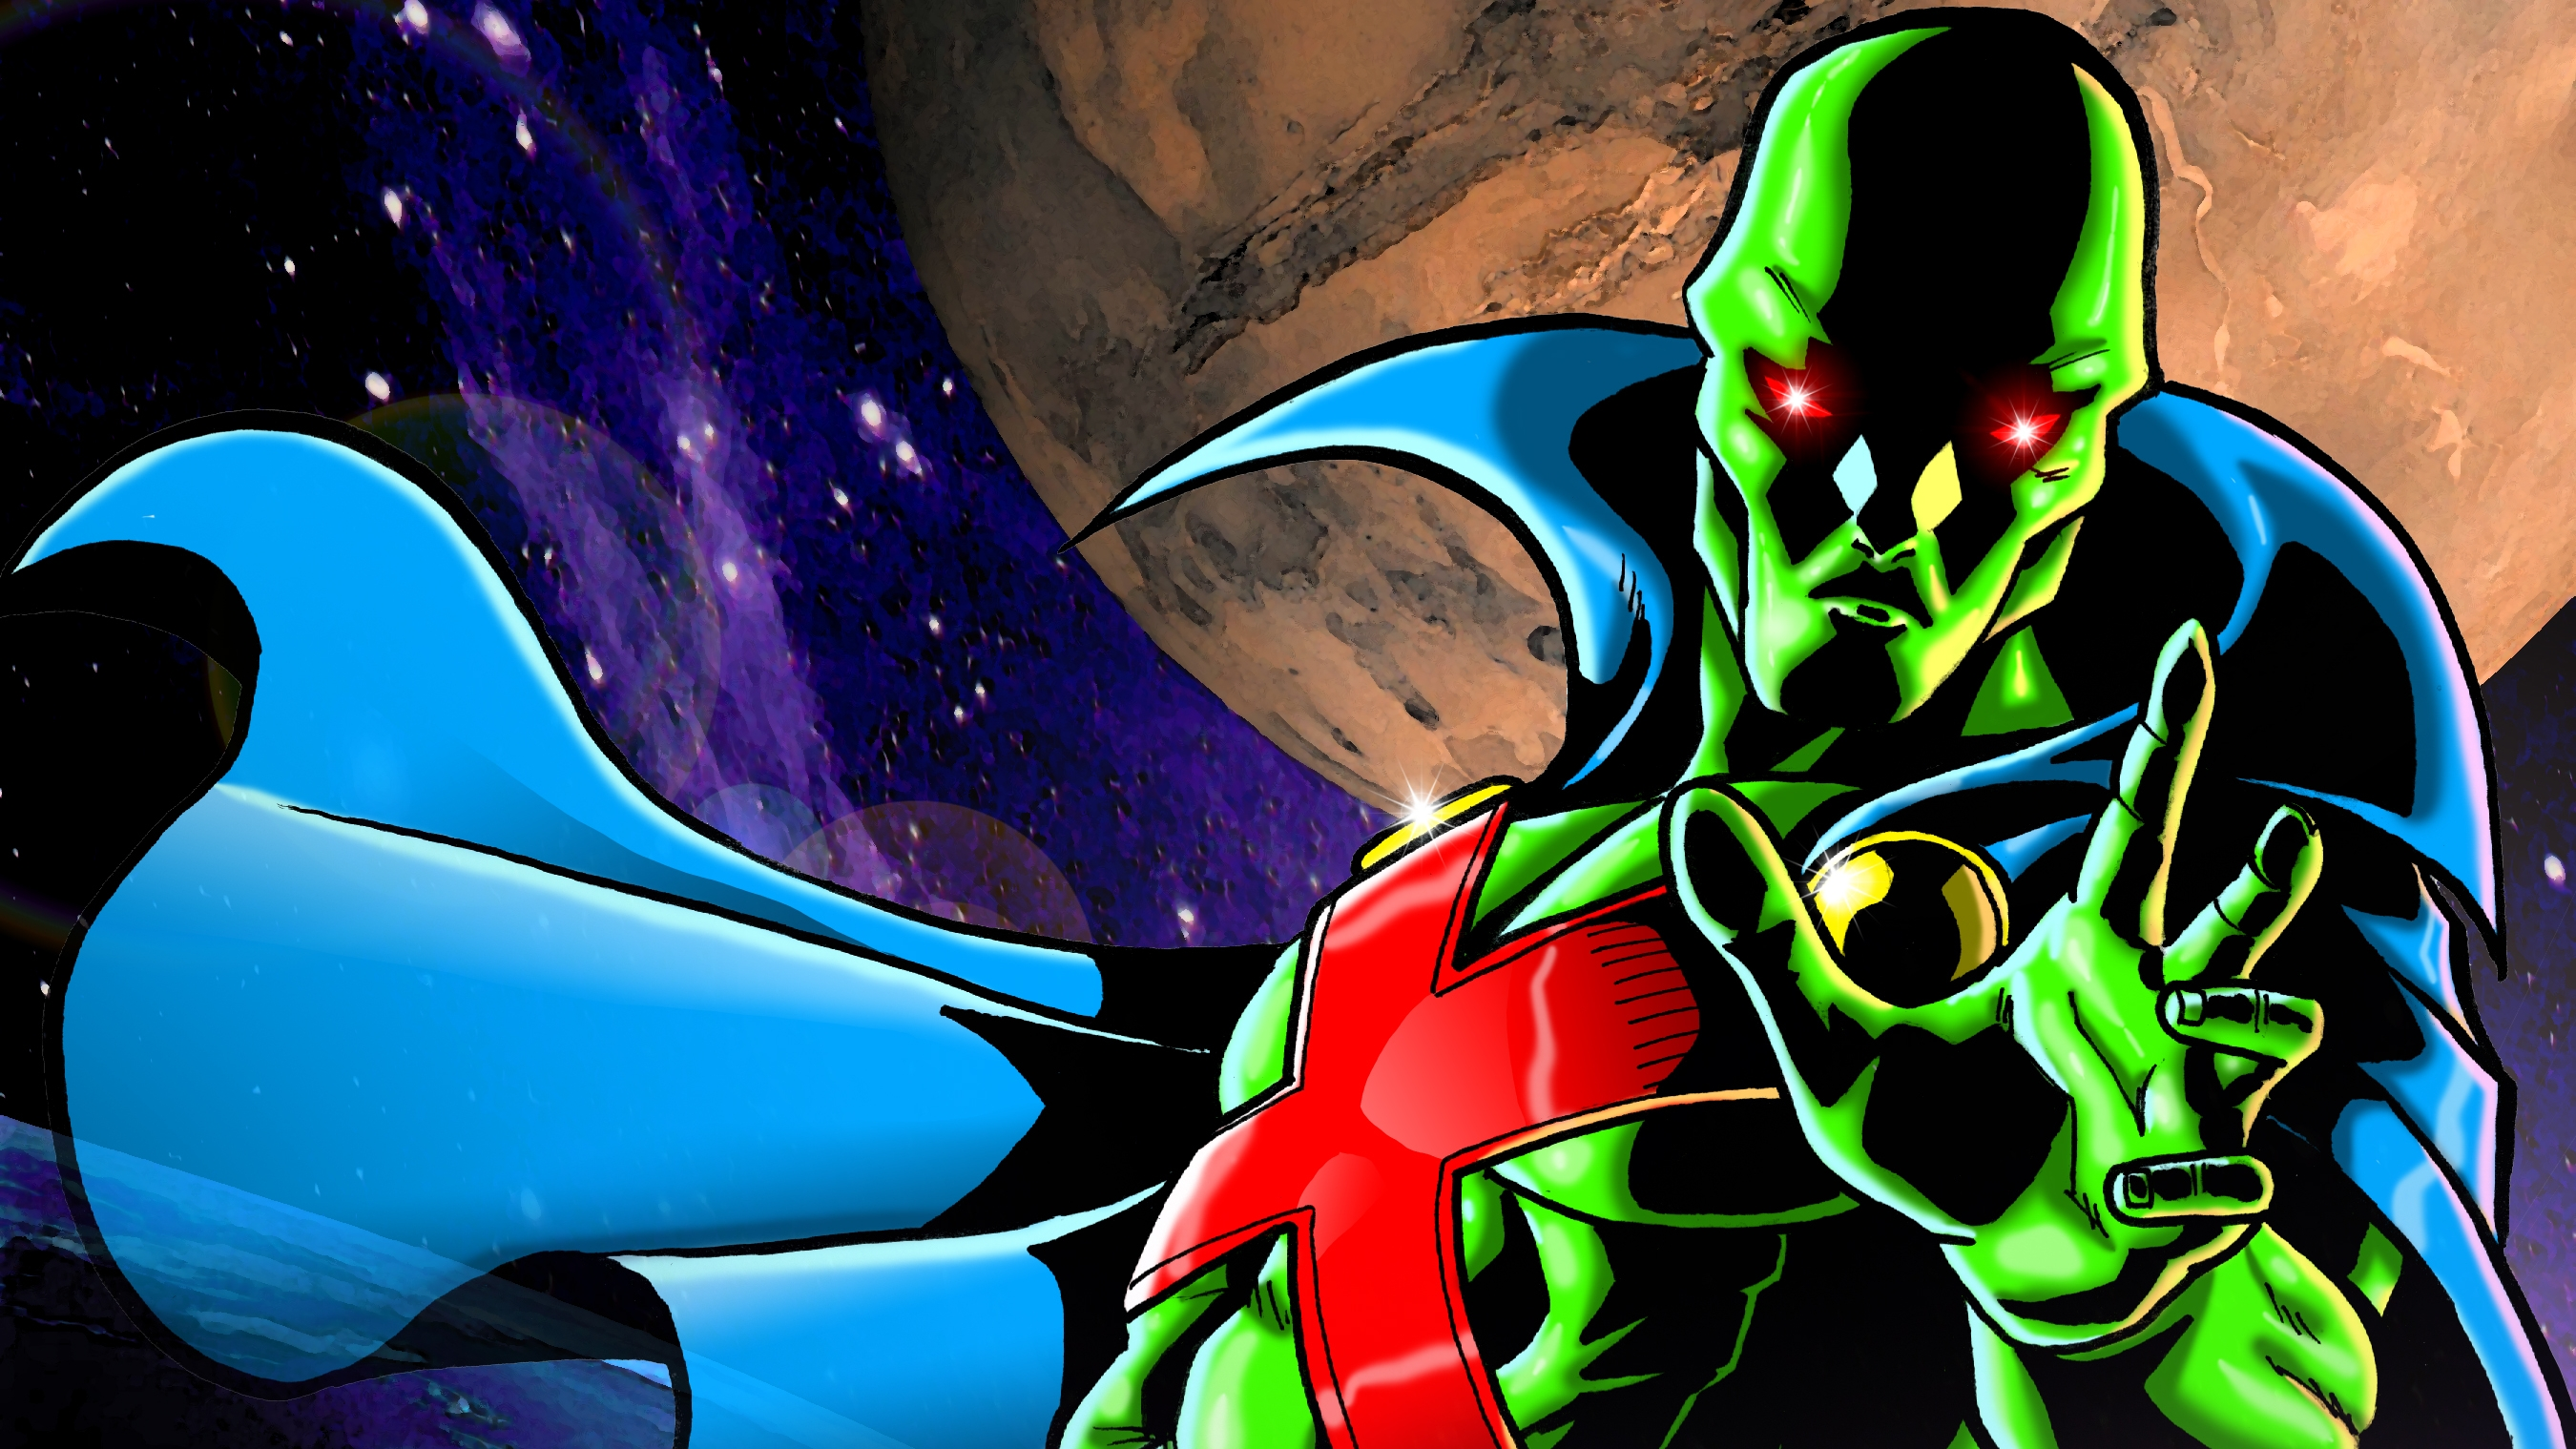 True Detective Wallpaper Iphone Martian Manhunter Full Hd Wallpaper And Background Image